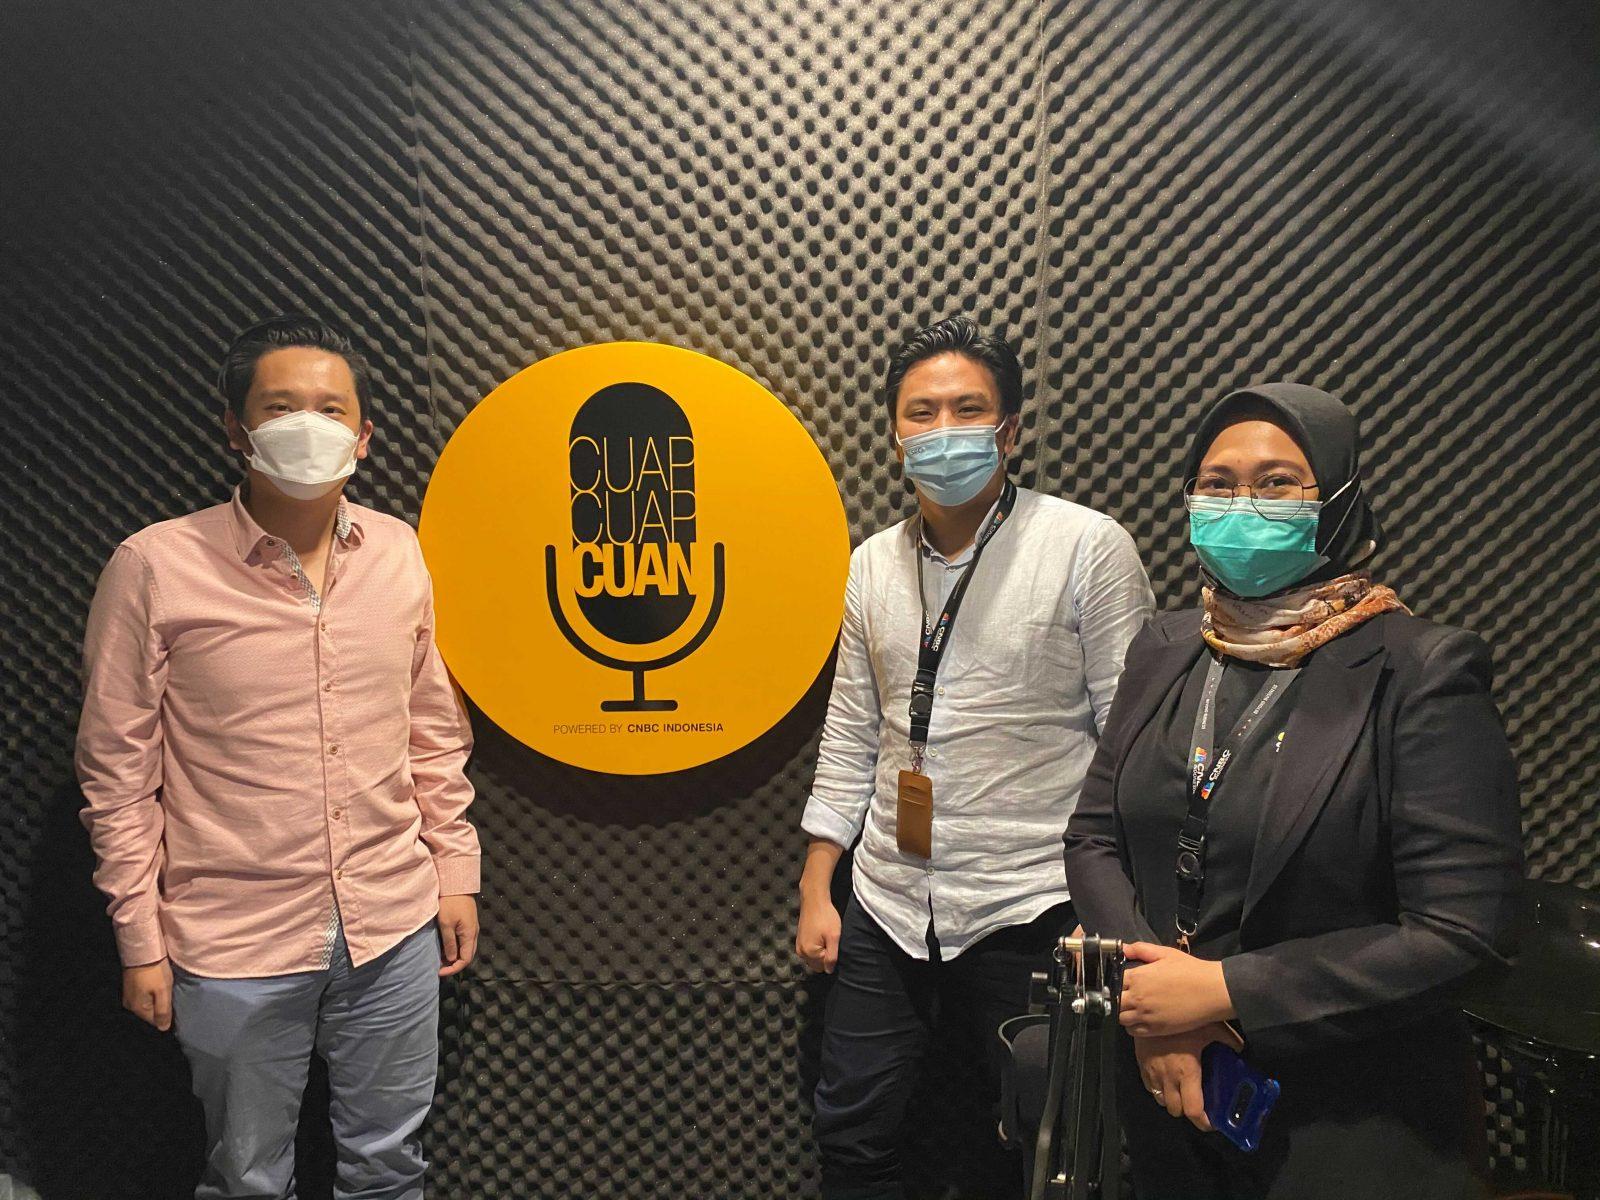 Tommy Martin Selaku Co-Founder dan COO Qoala Hadir di Podcast Cuap Cuap Cuan